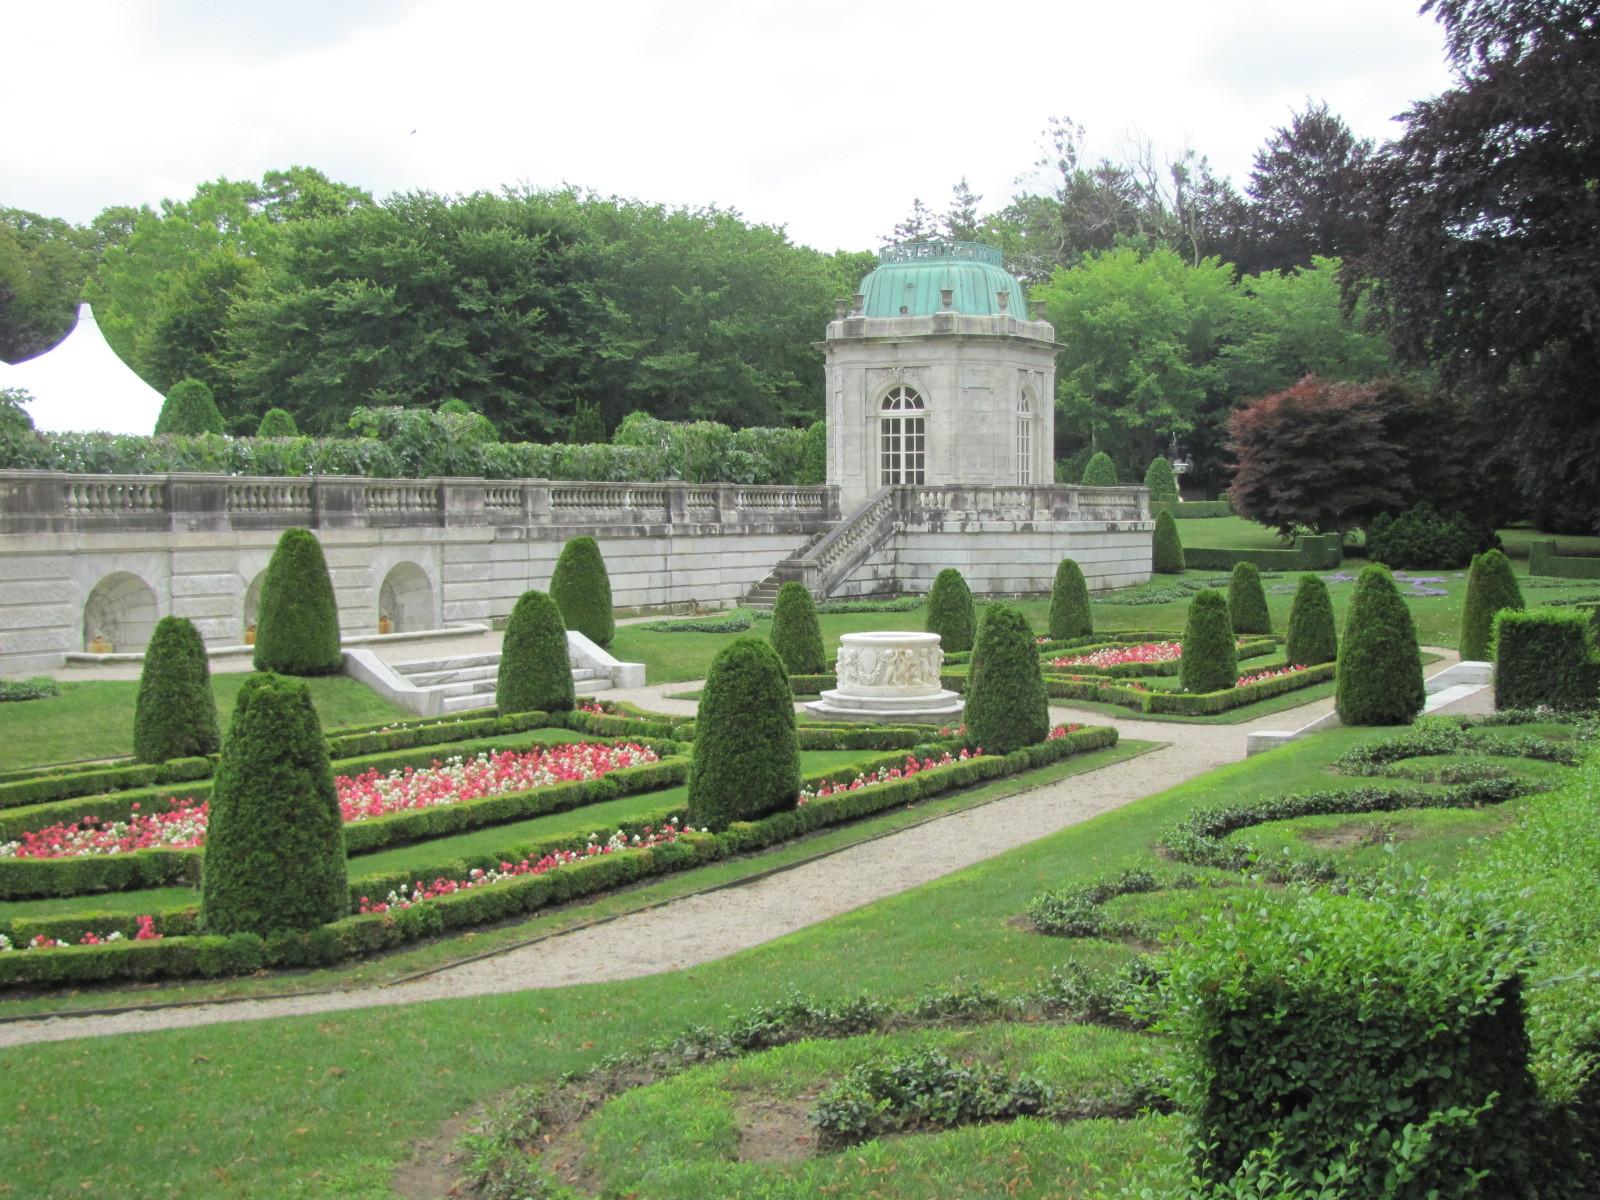 The Elms Garden